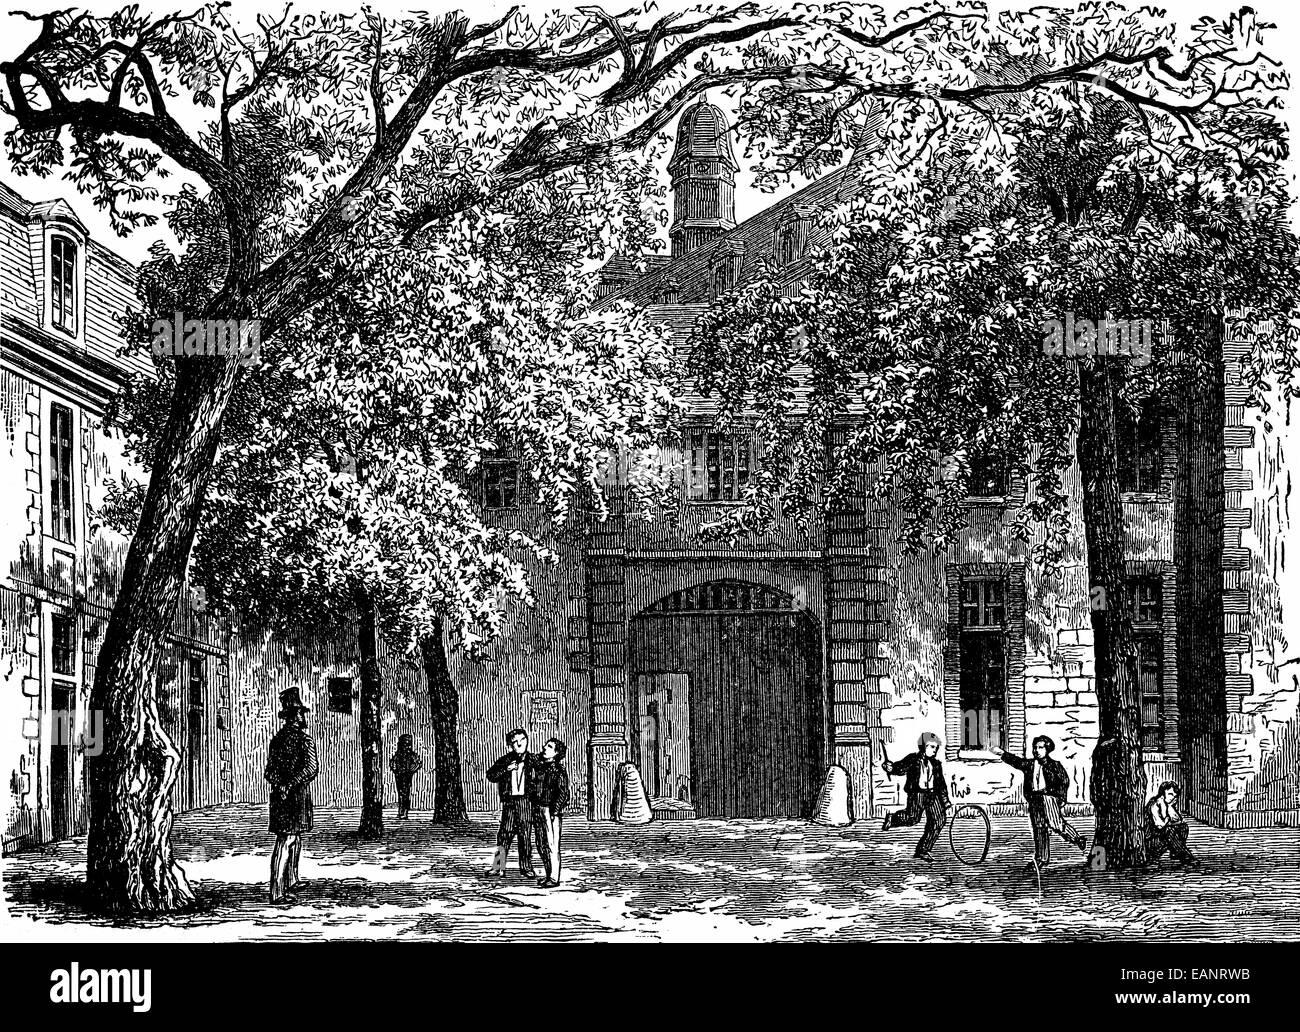 Vendome. Courtyard of the college of Vendome, vintage engraved illustration. Journal des Voyages, Travel Journal, - Stock Image